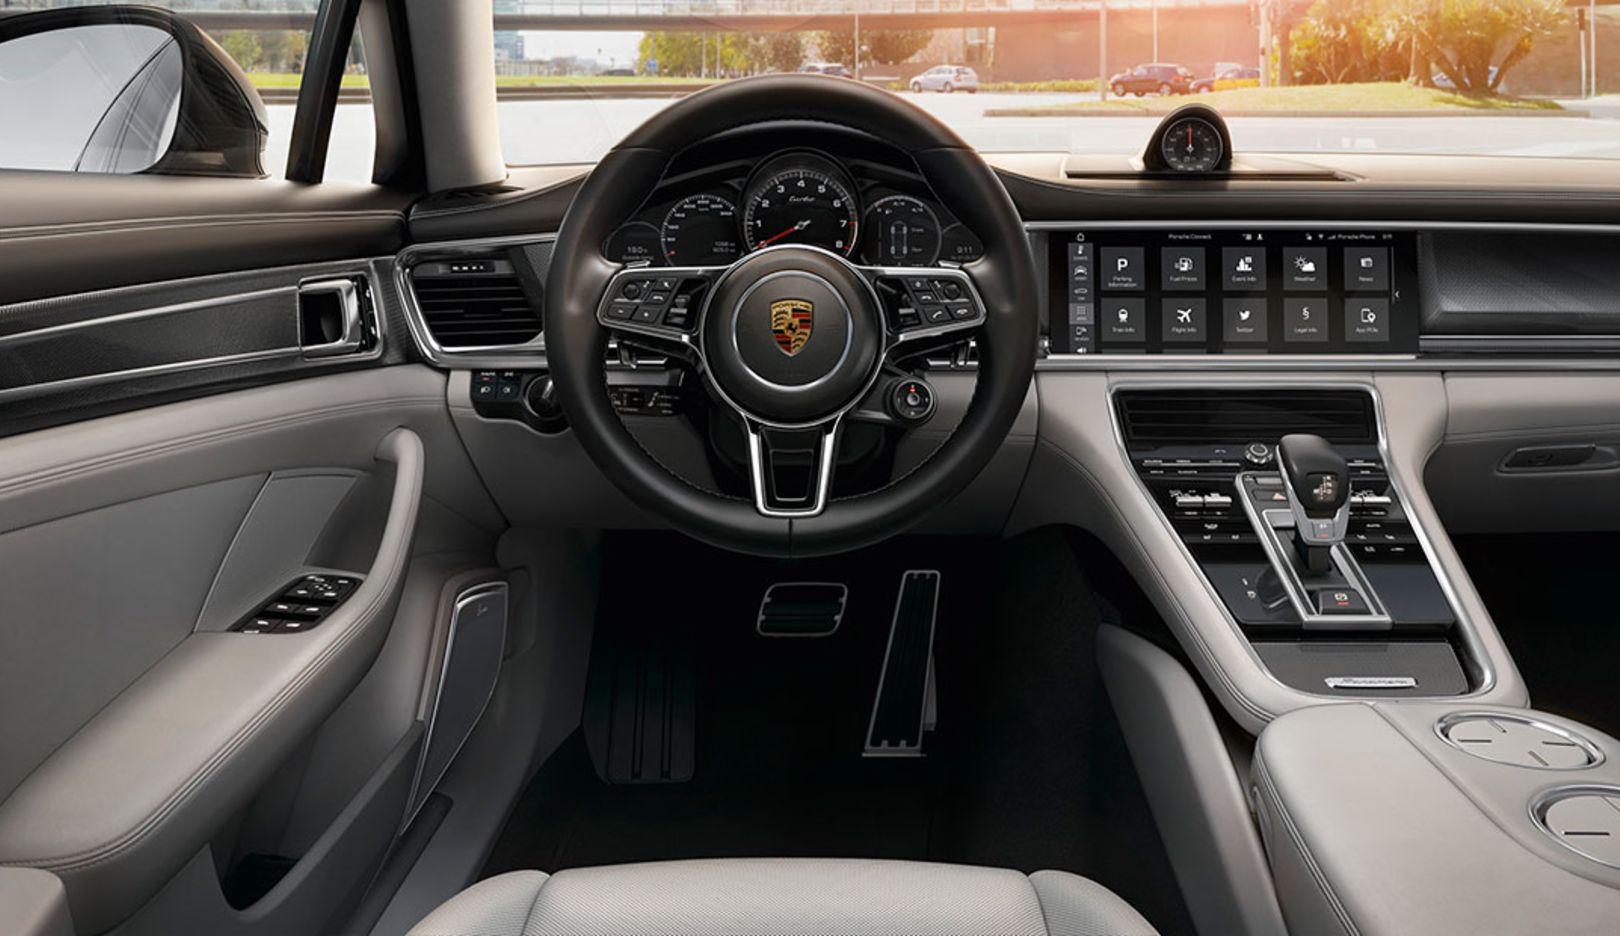 Infotainment services, Porsche Connect, Panamera, 2016, Porsche AG